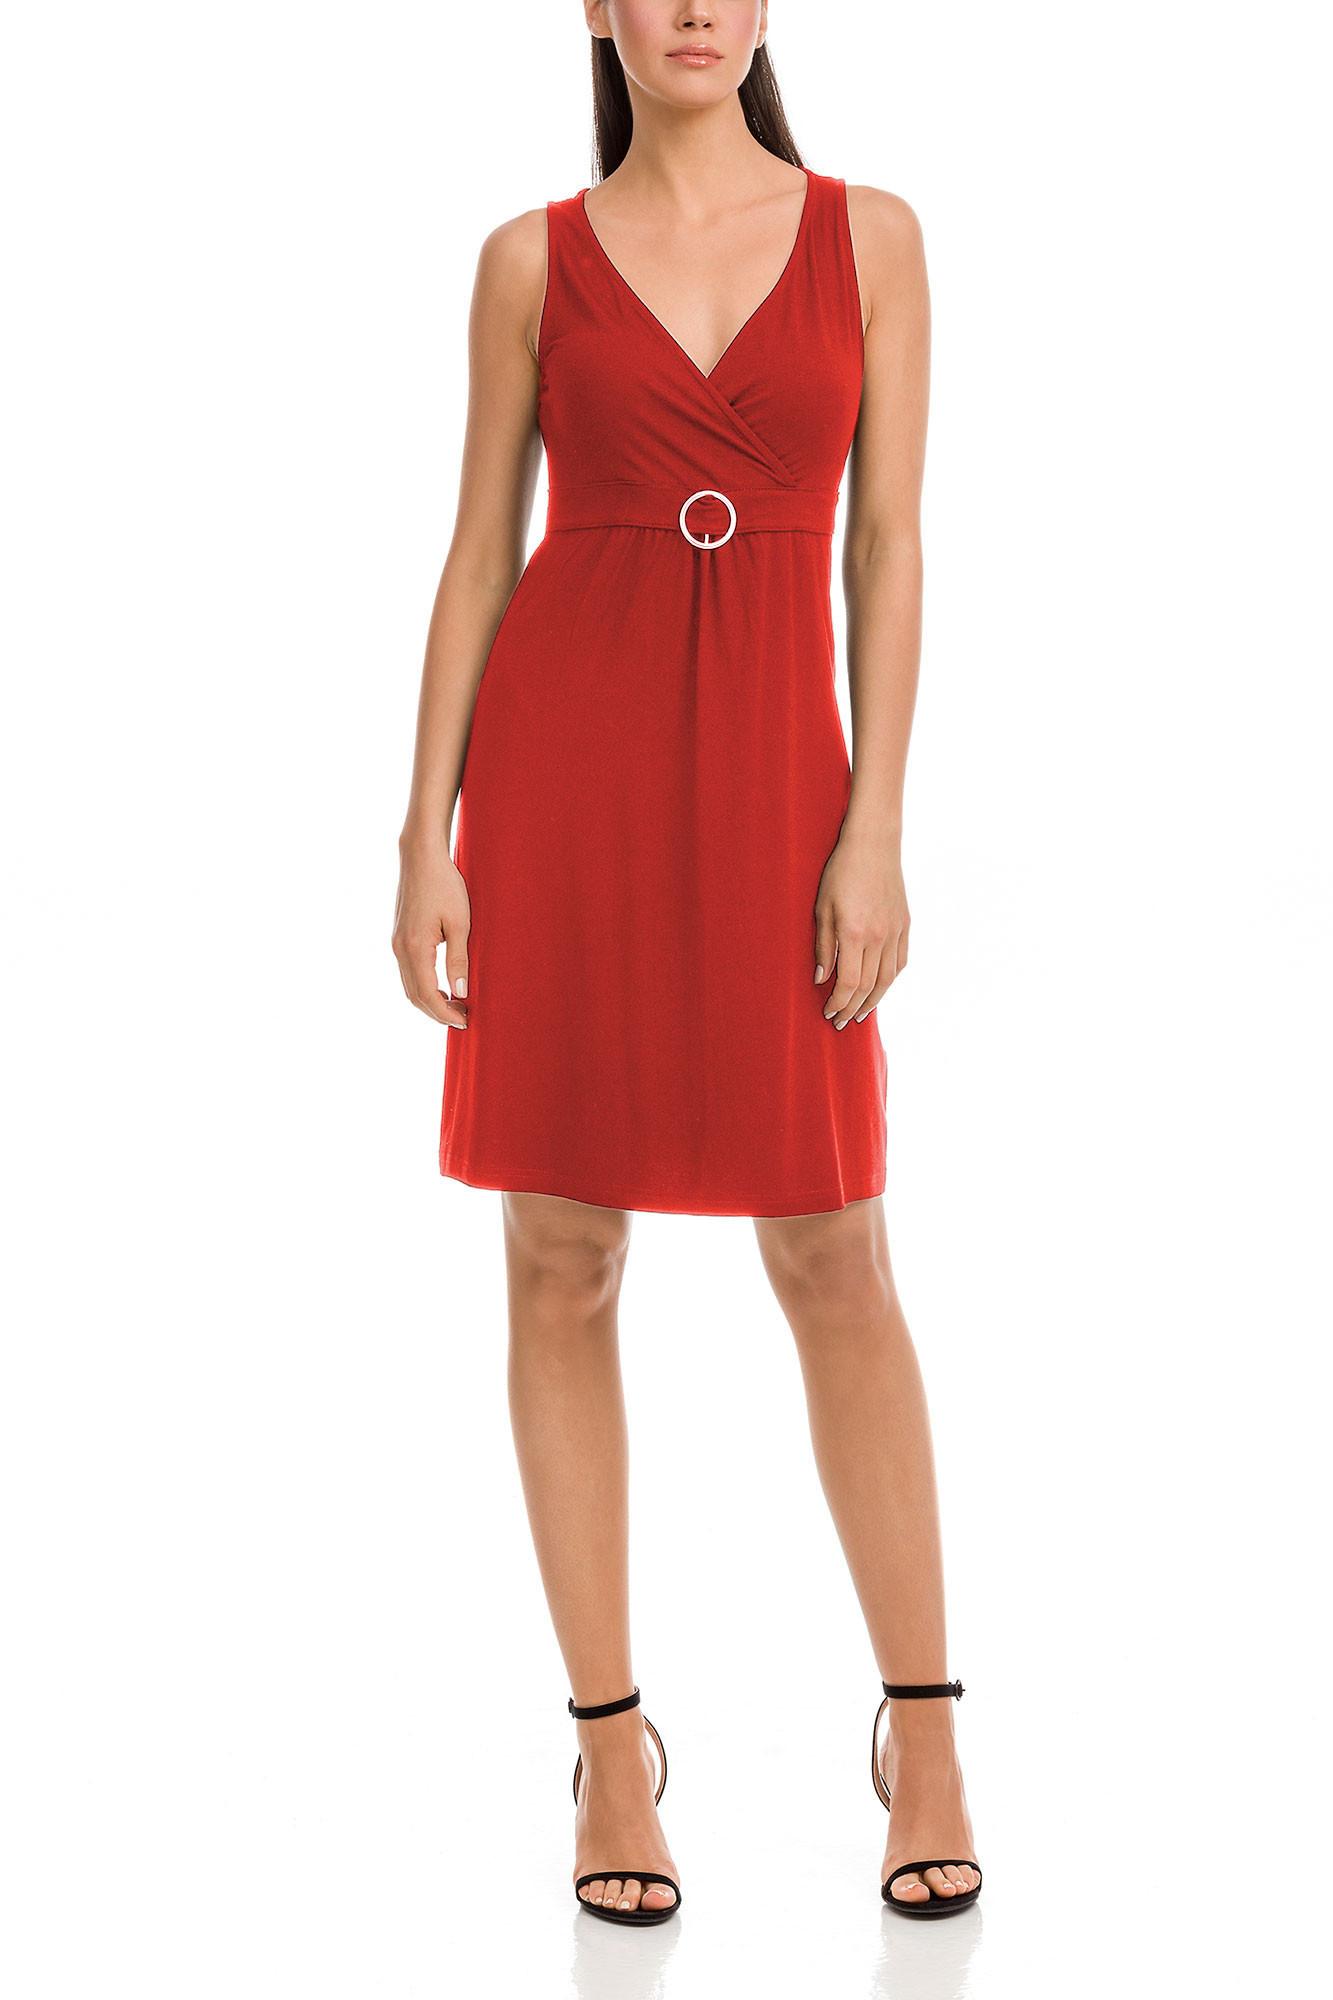 Vamp - Dámske šaty 12573 - Vamp red terracota l